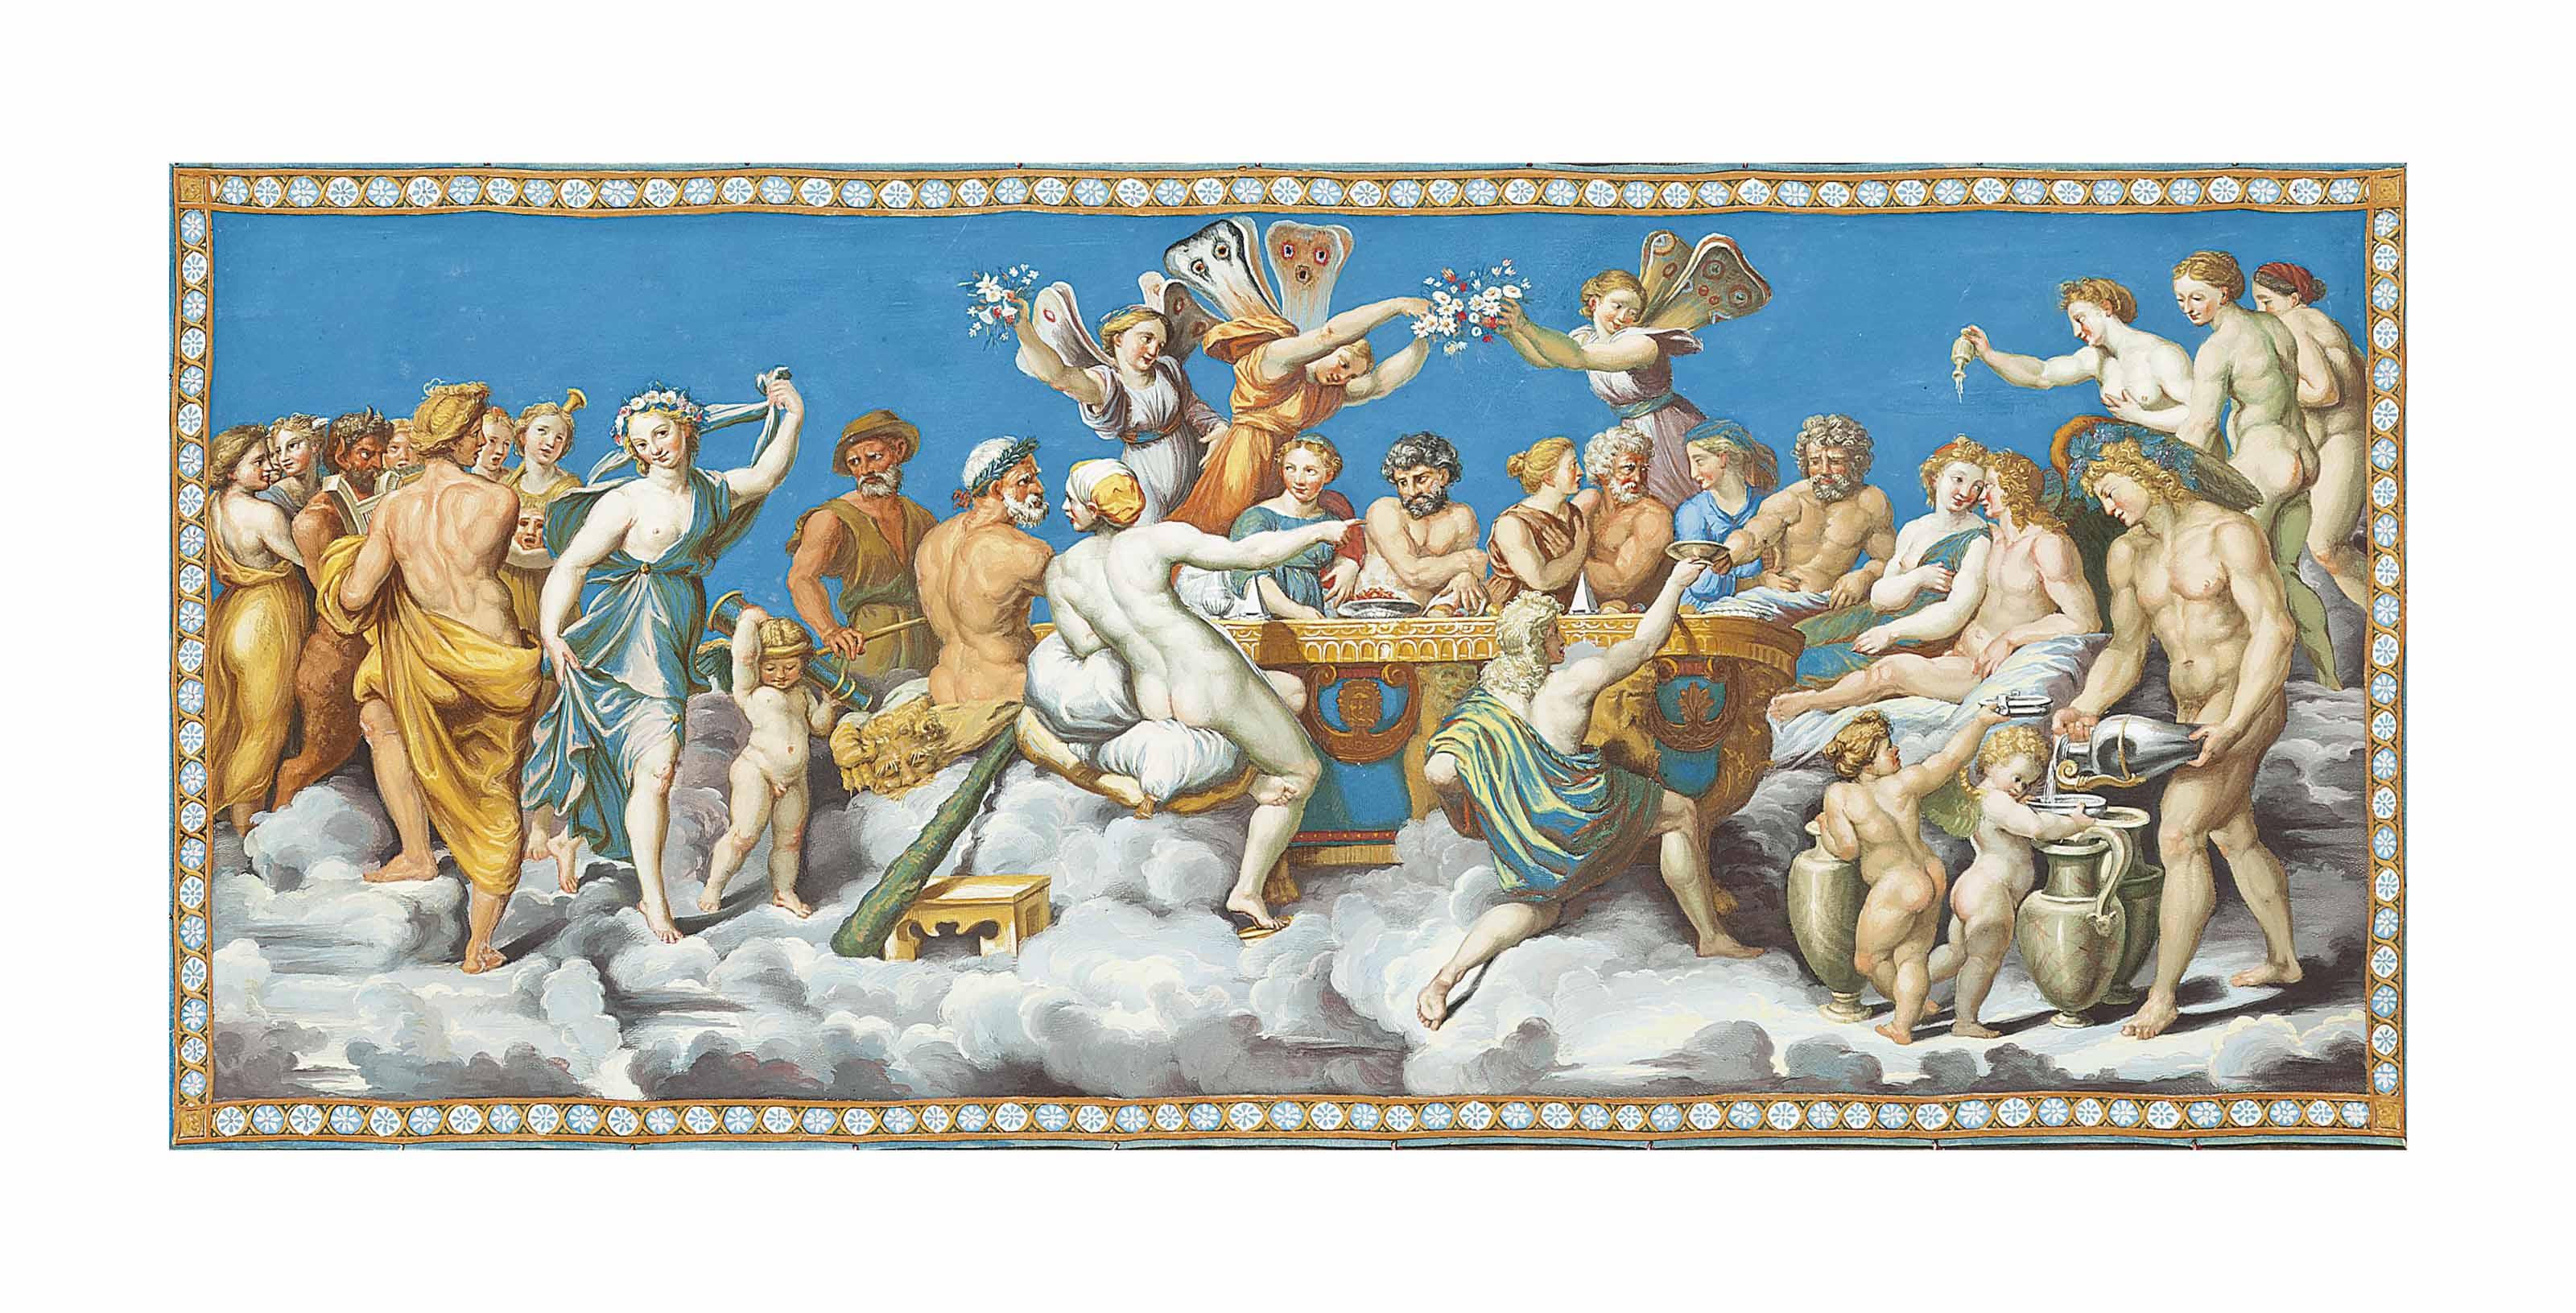 After Raphael Sanzio, called Raphael